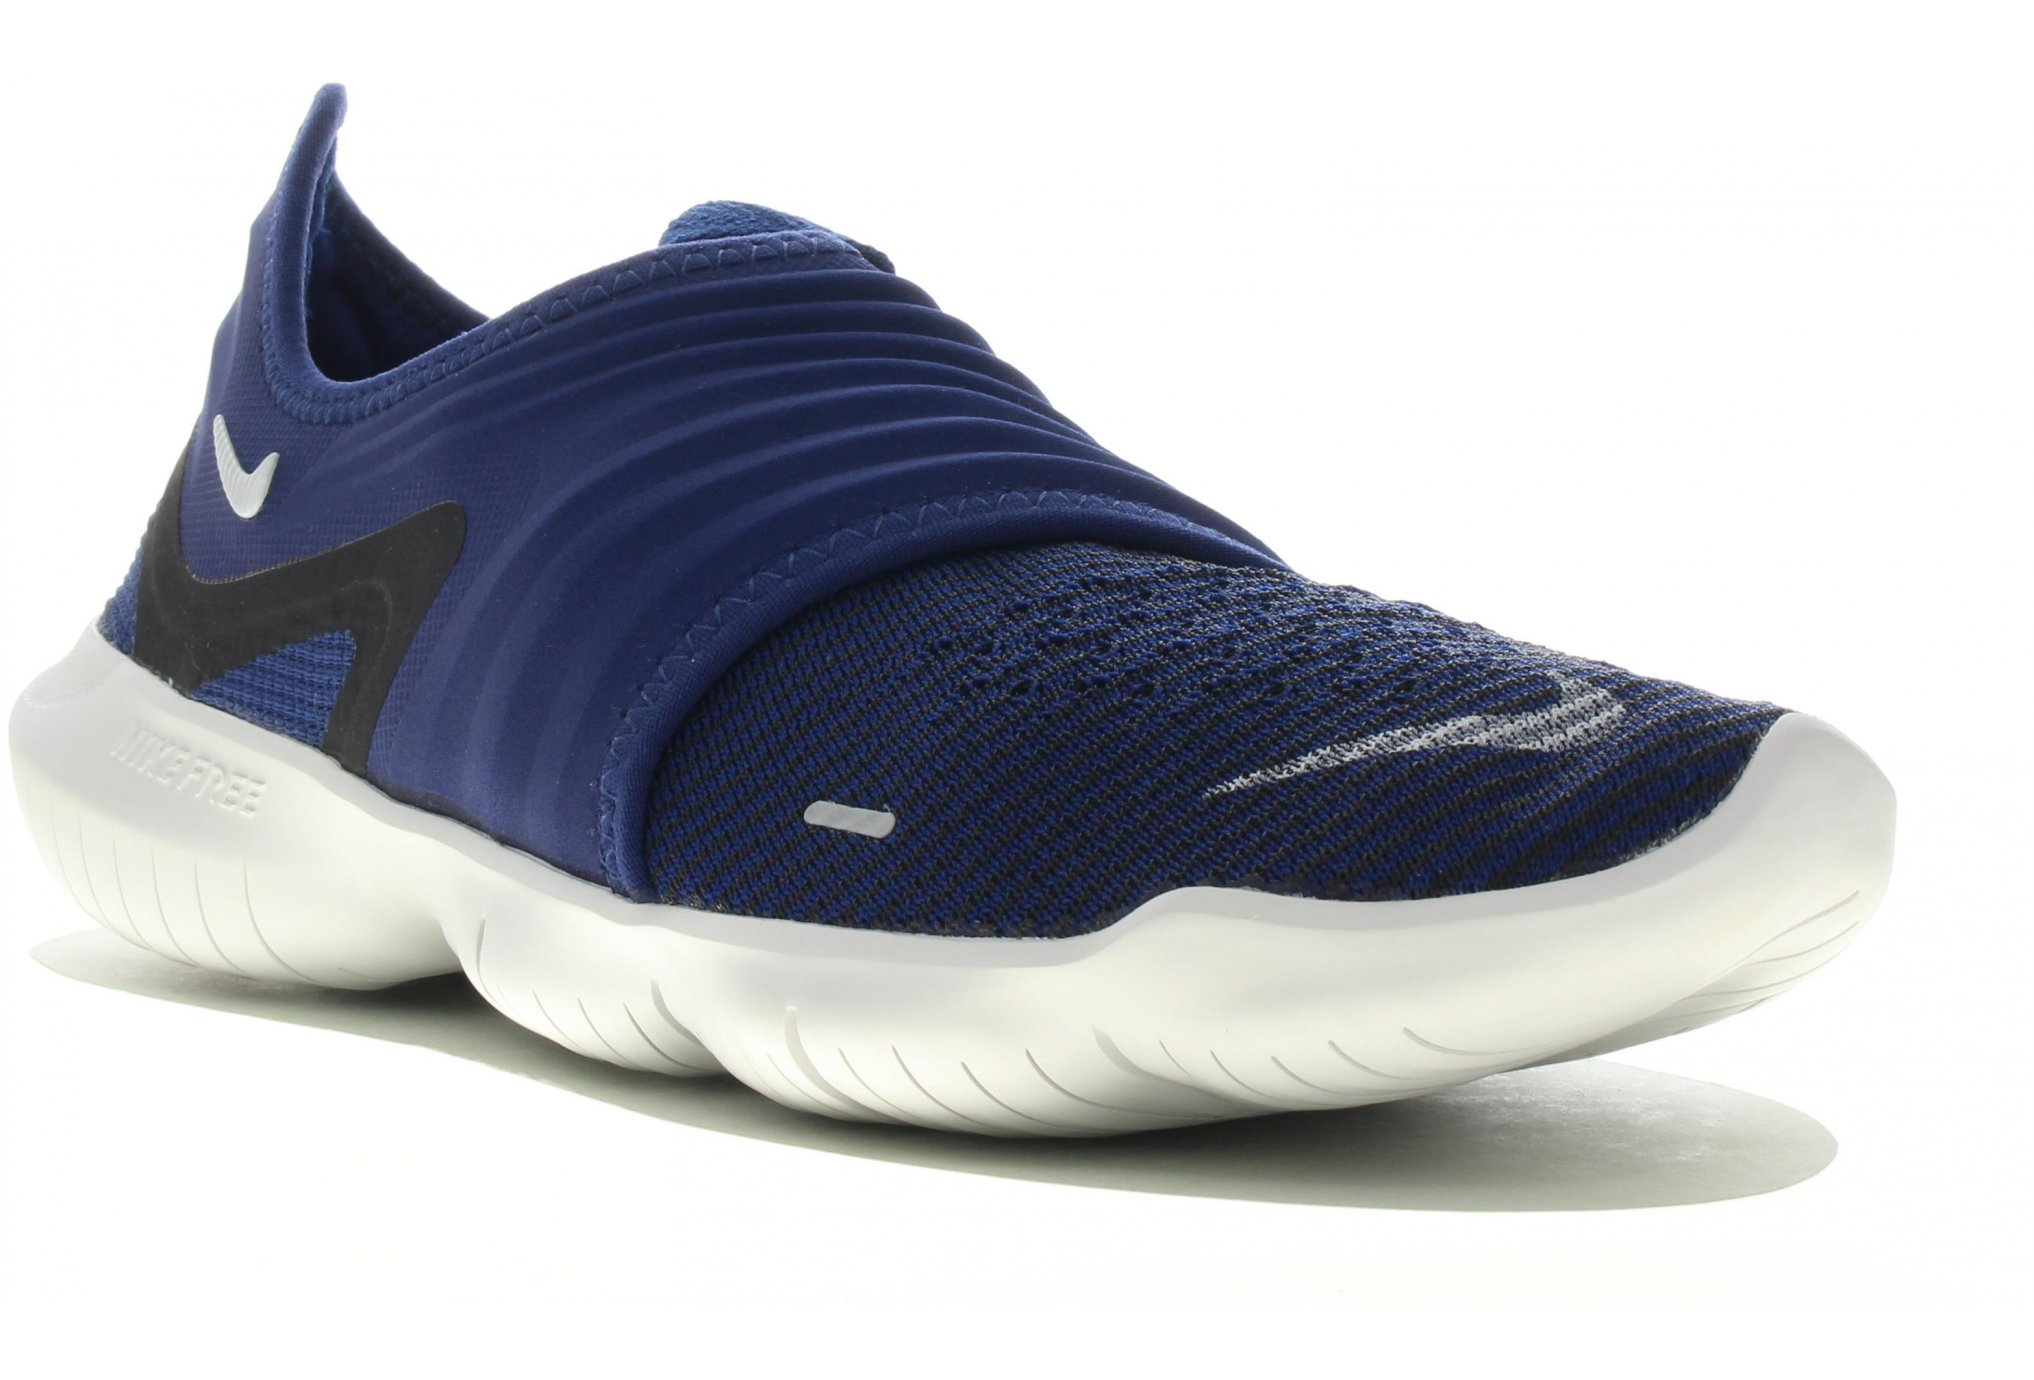 Nike Free RN Flyknit 3.0 M Diététique Chaussures homme